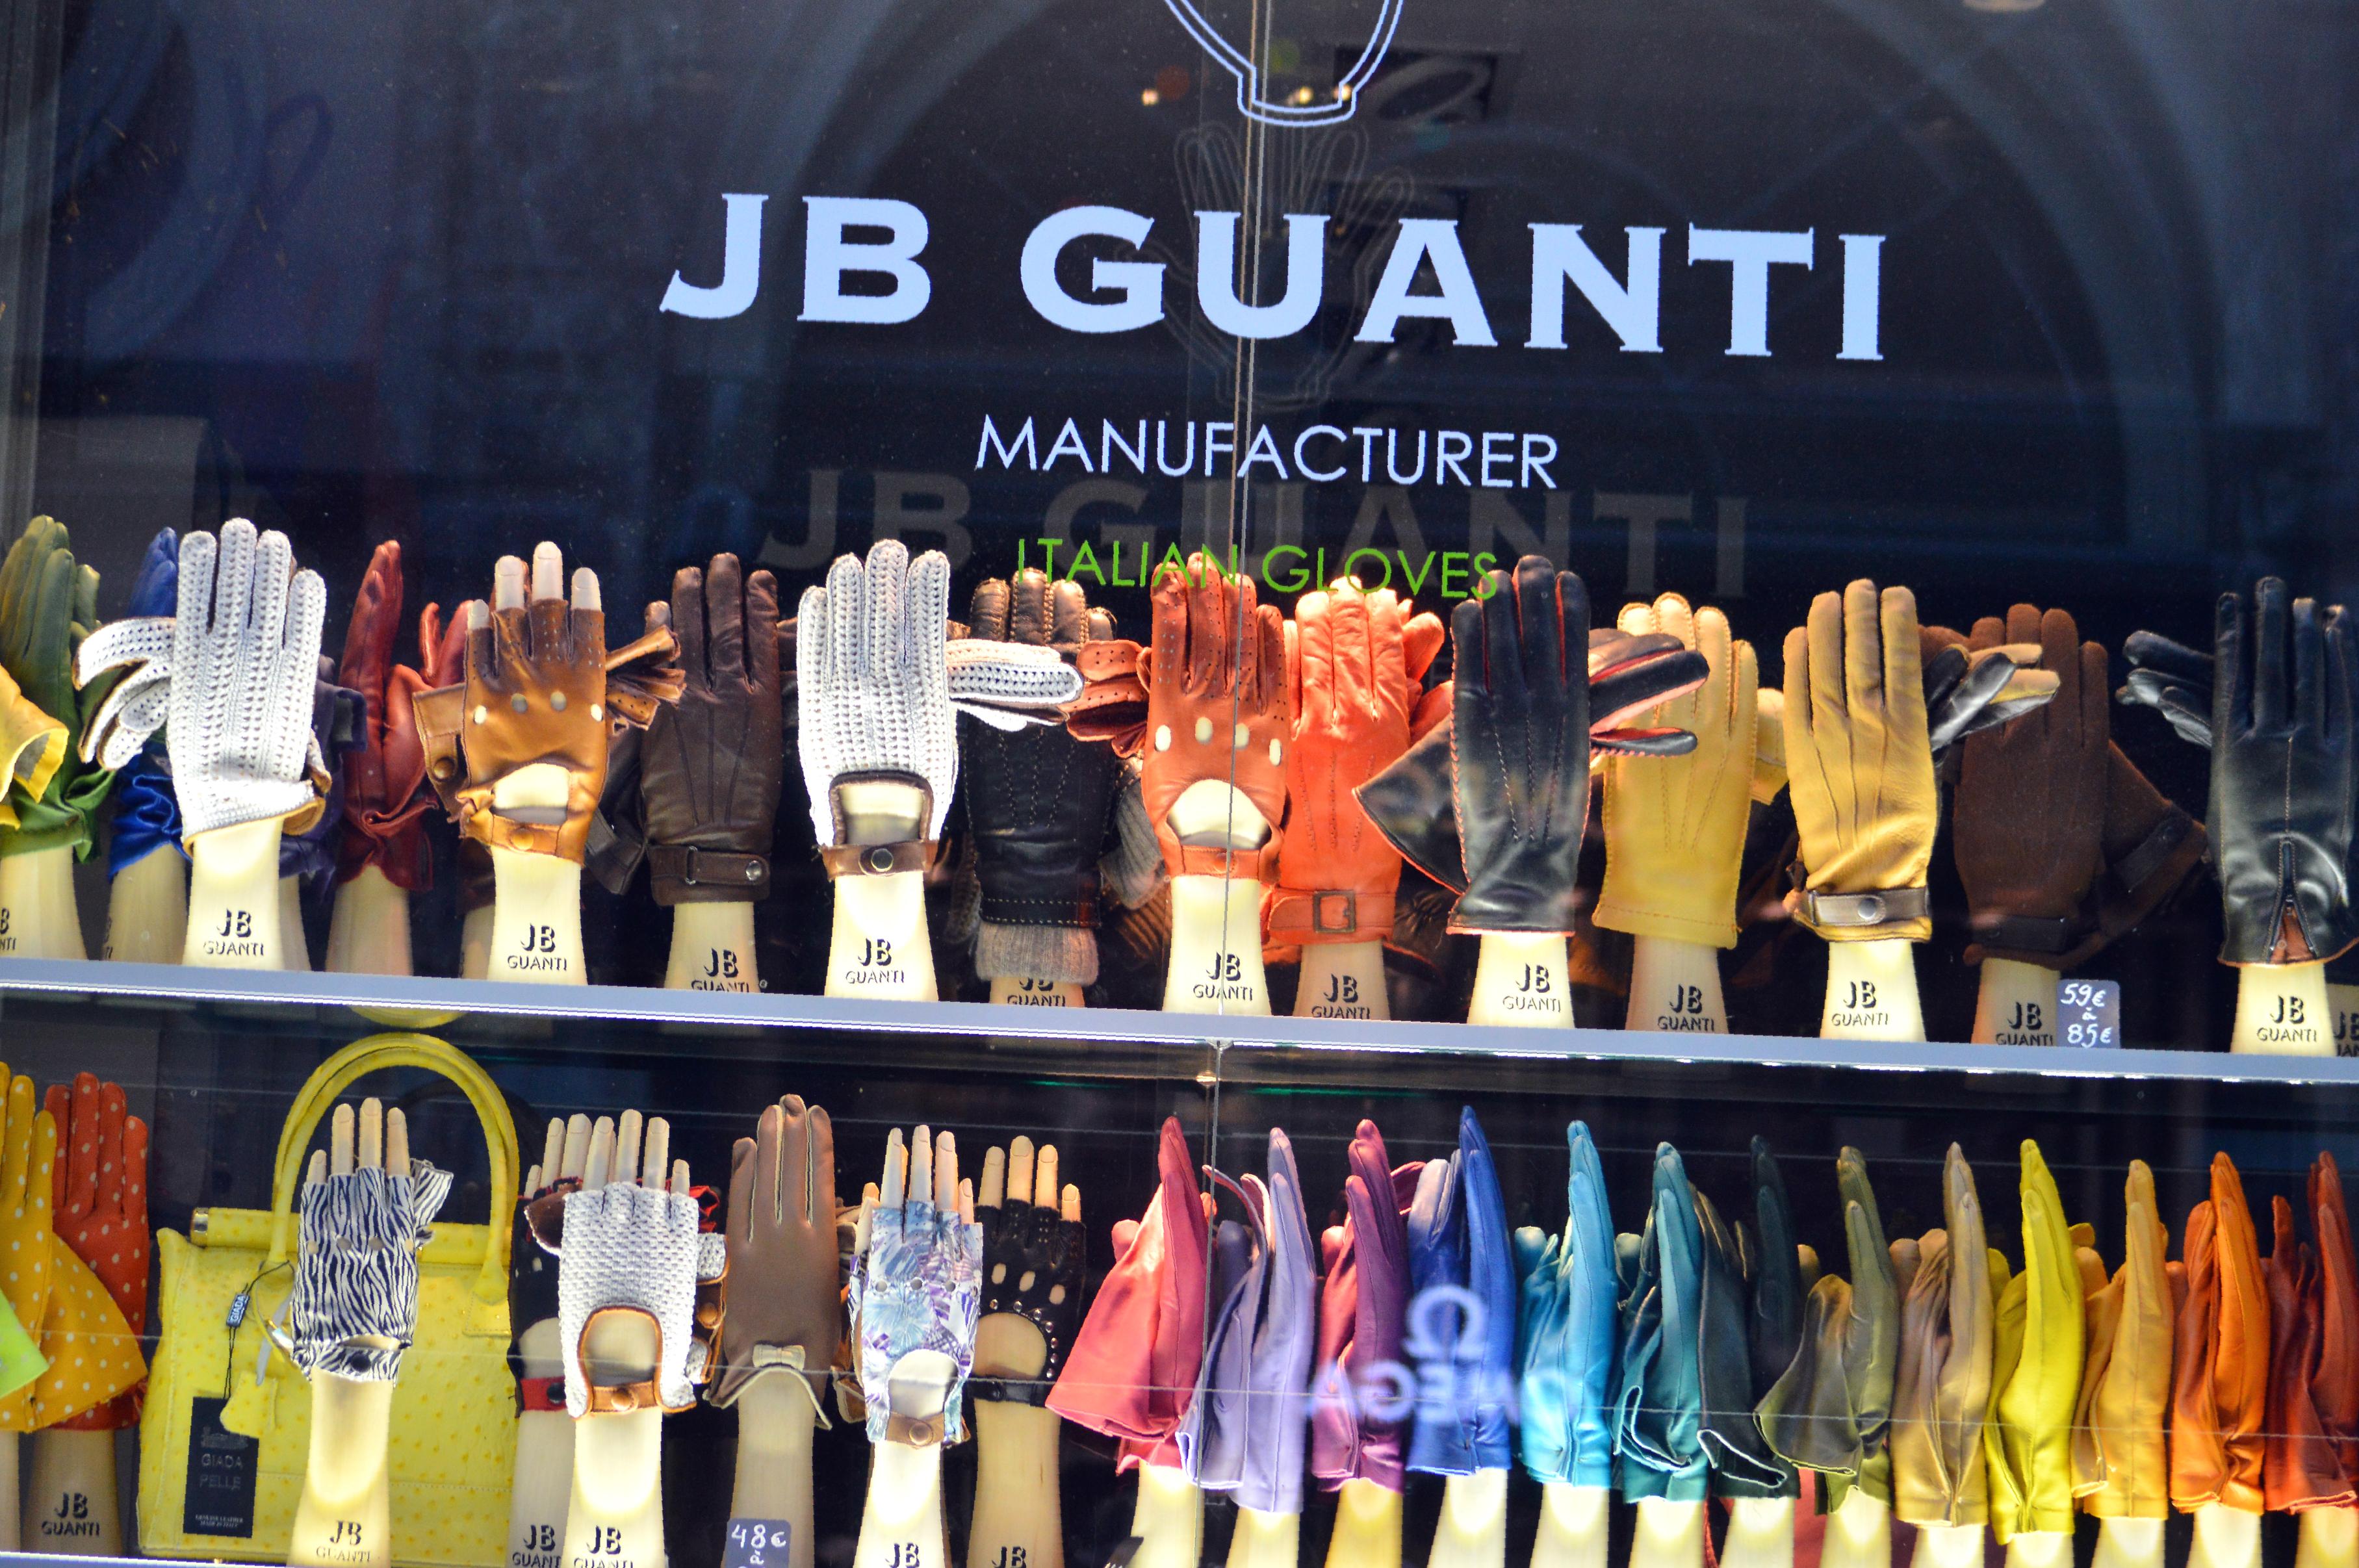 leather gloves,window shopping in brussels, shopping streets in brussels, glamthug blog, belgian fashion, galerie de la reine